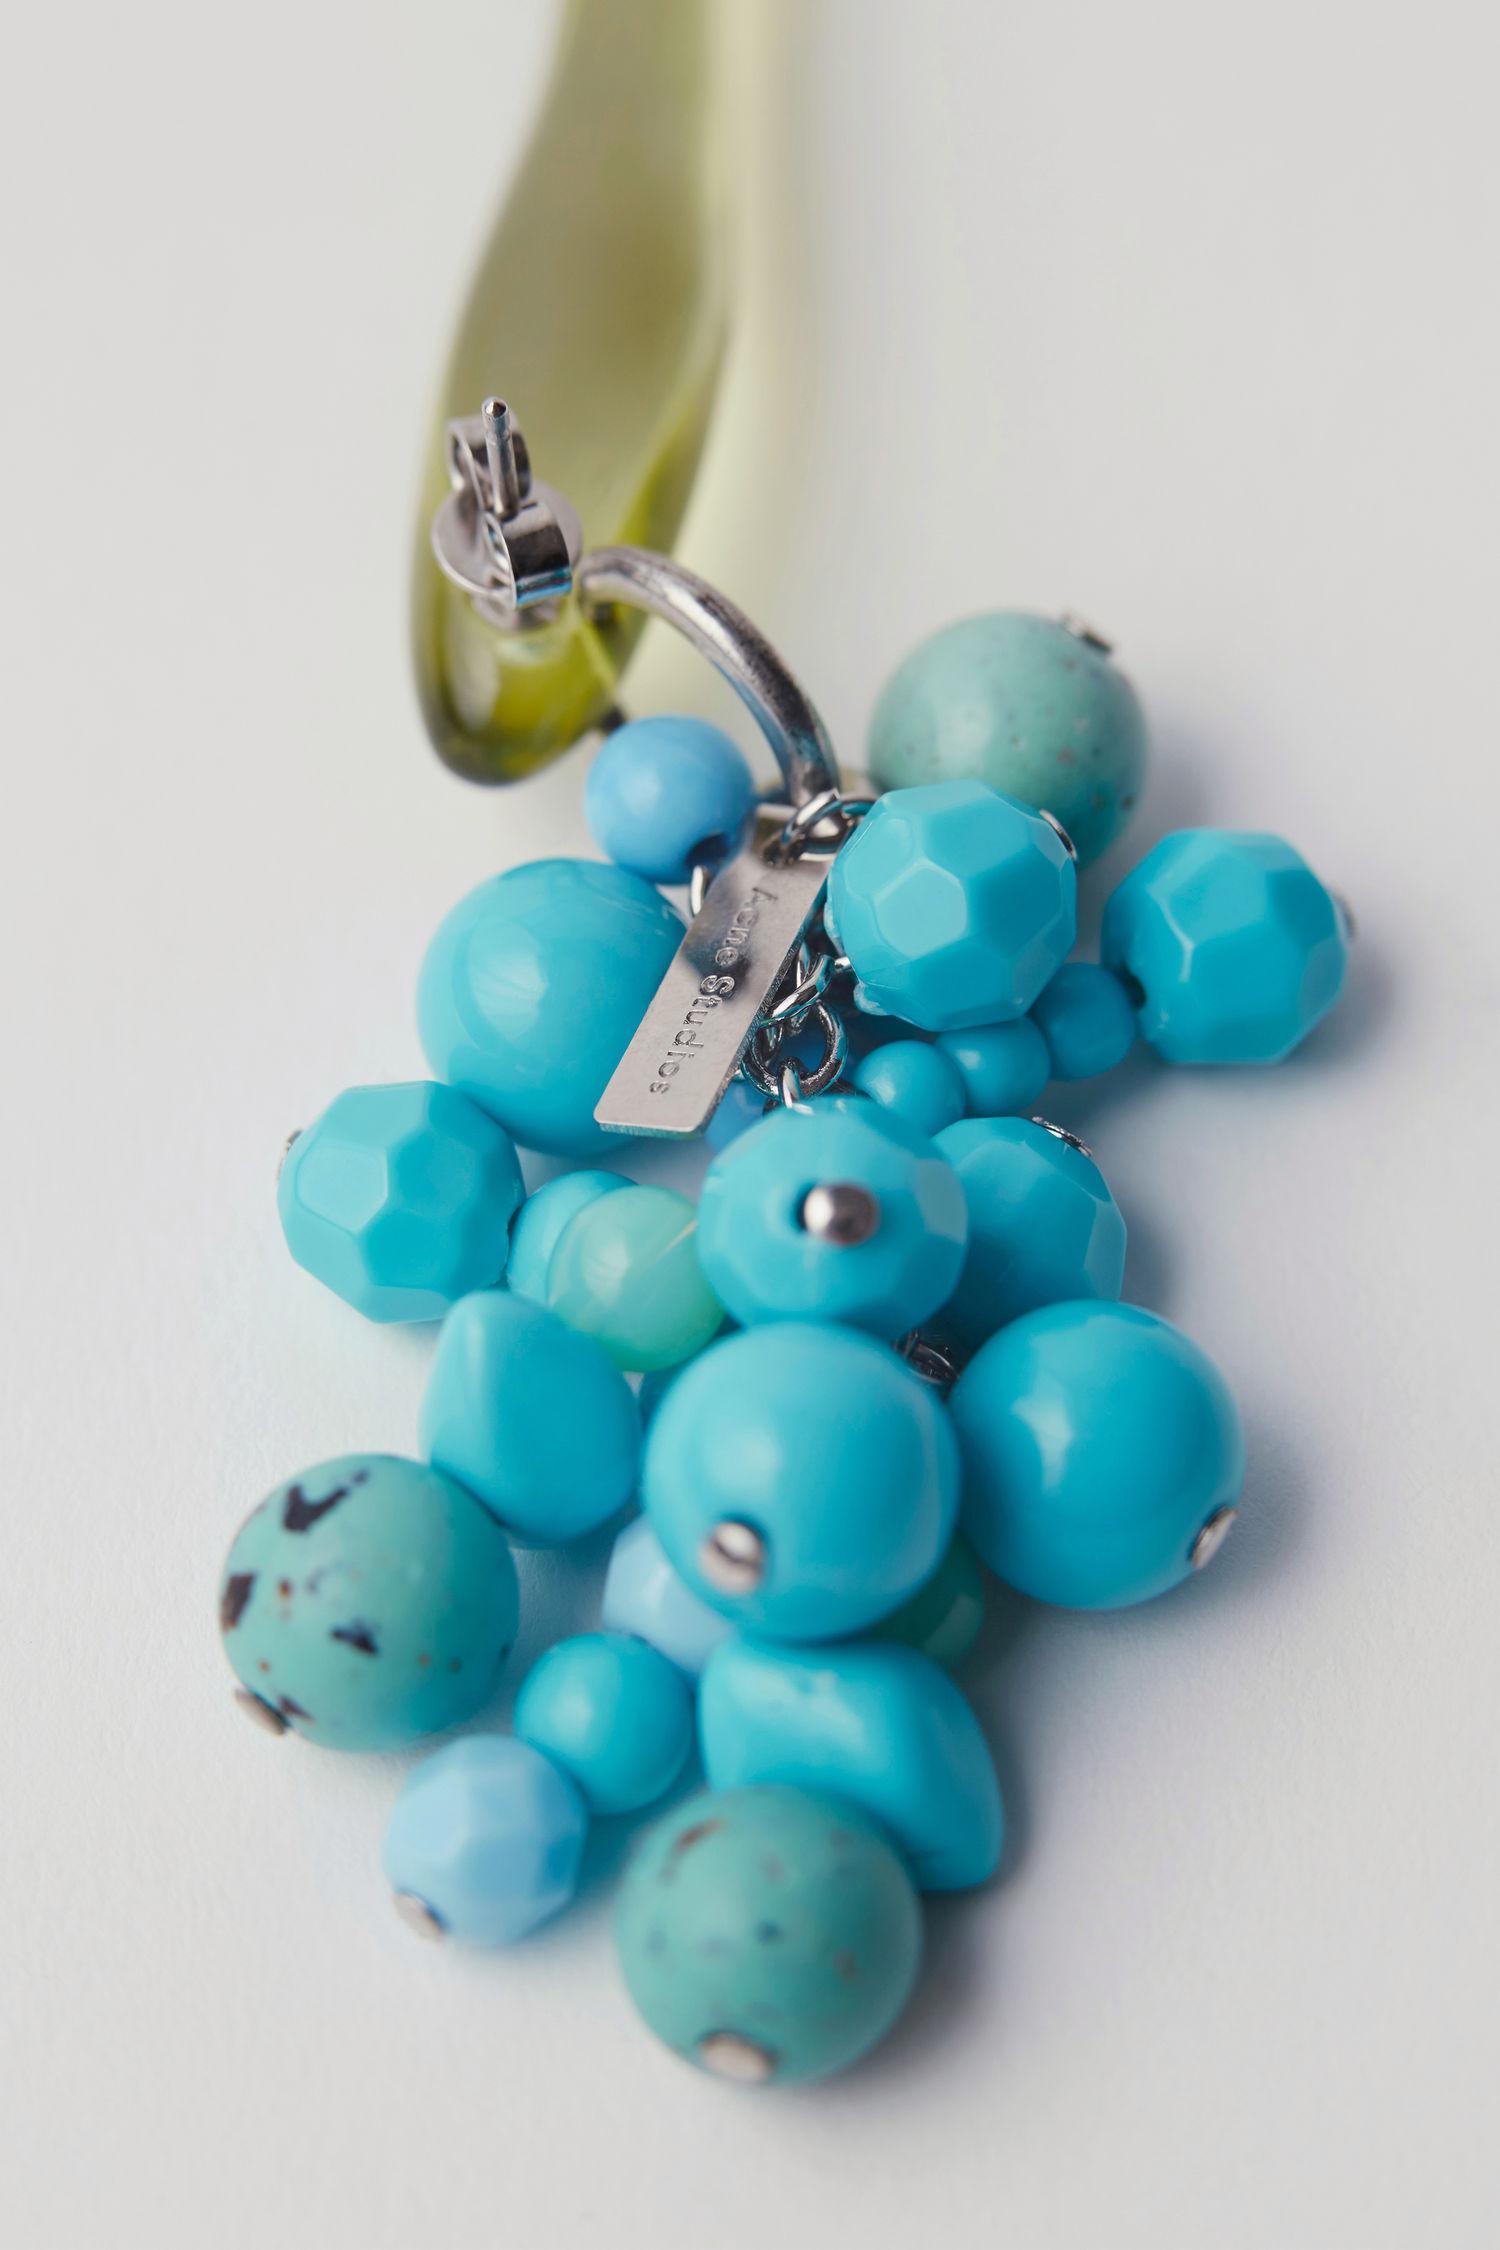 Acne Studios Synthetic Resin And Bead Earring acid Yellow/turquoise